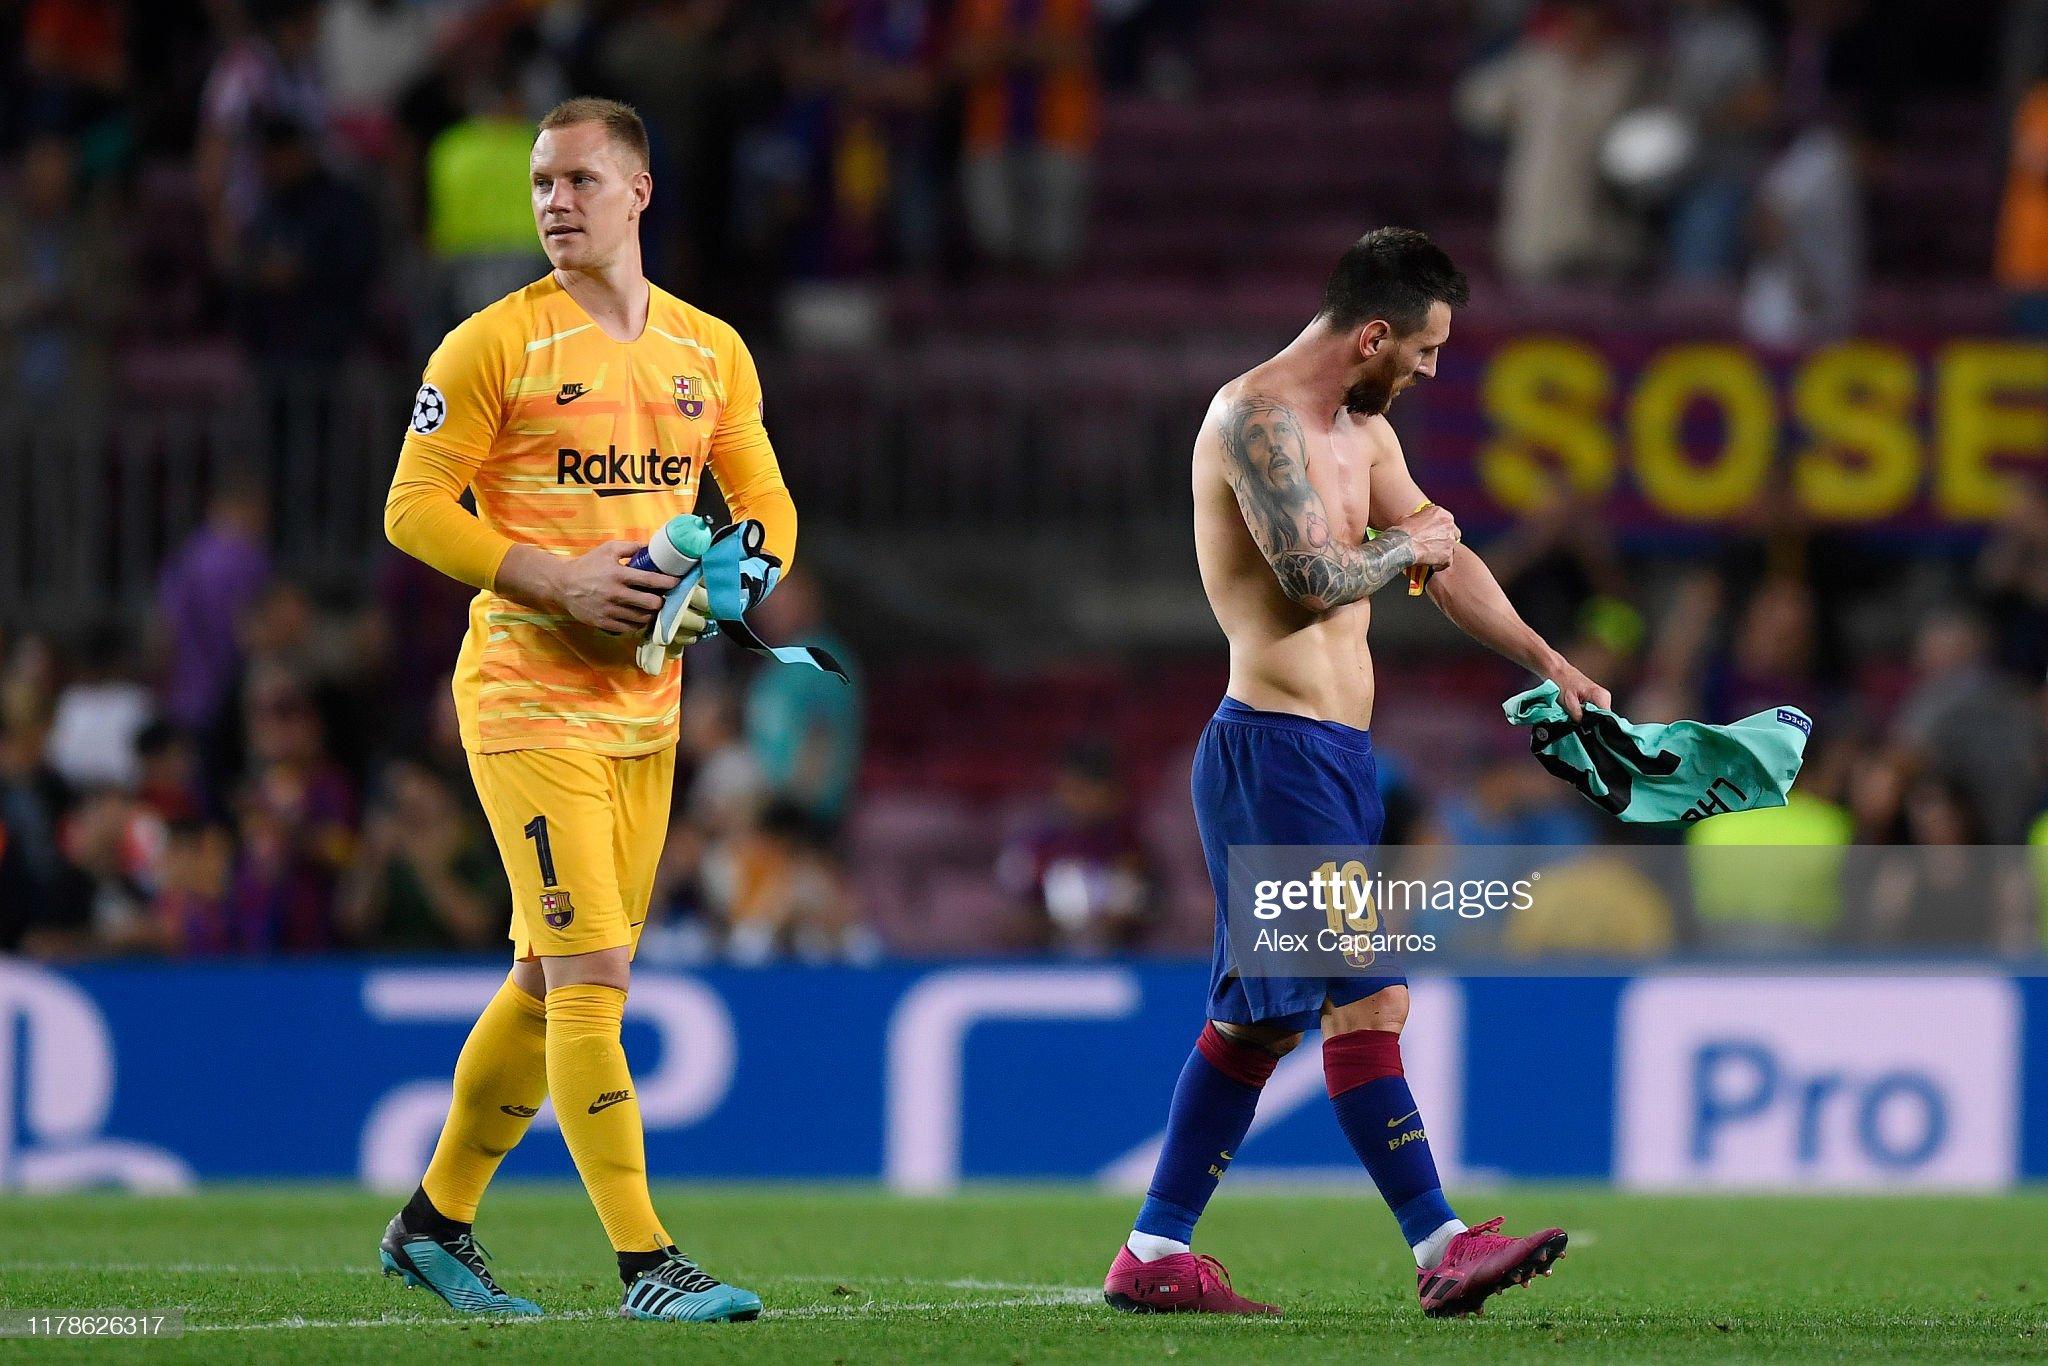 صور مباراة : برشلونة - إنتر 2-1 ( 02-10-2019 )  Marcandr-ter-stegen-and-lionel-messi-of-fc-barcelona-after-the-match-picture-id1178626317?s=2048x2048